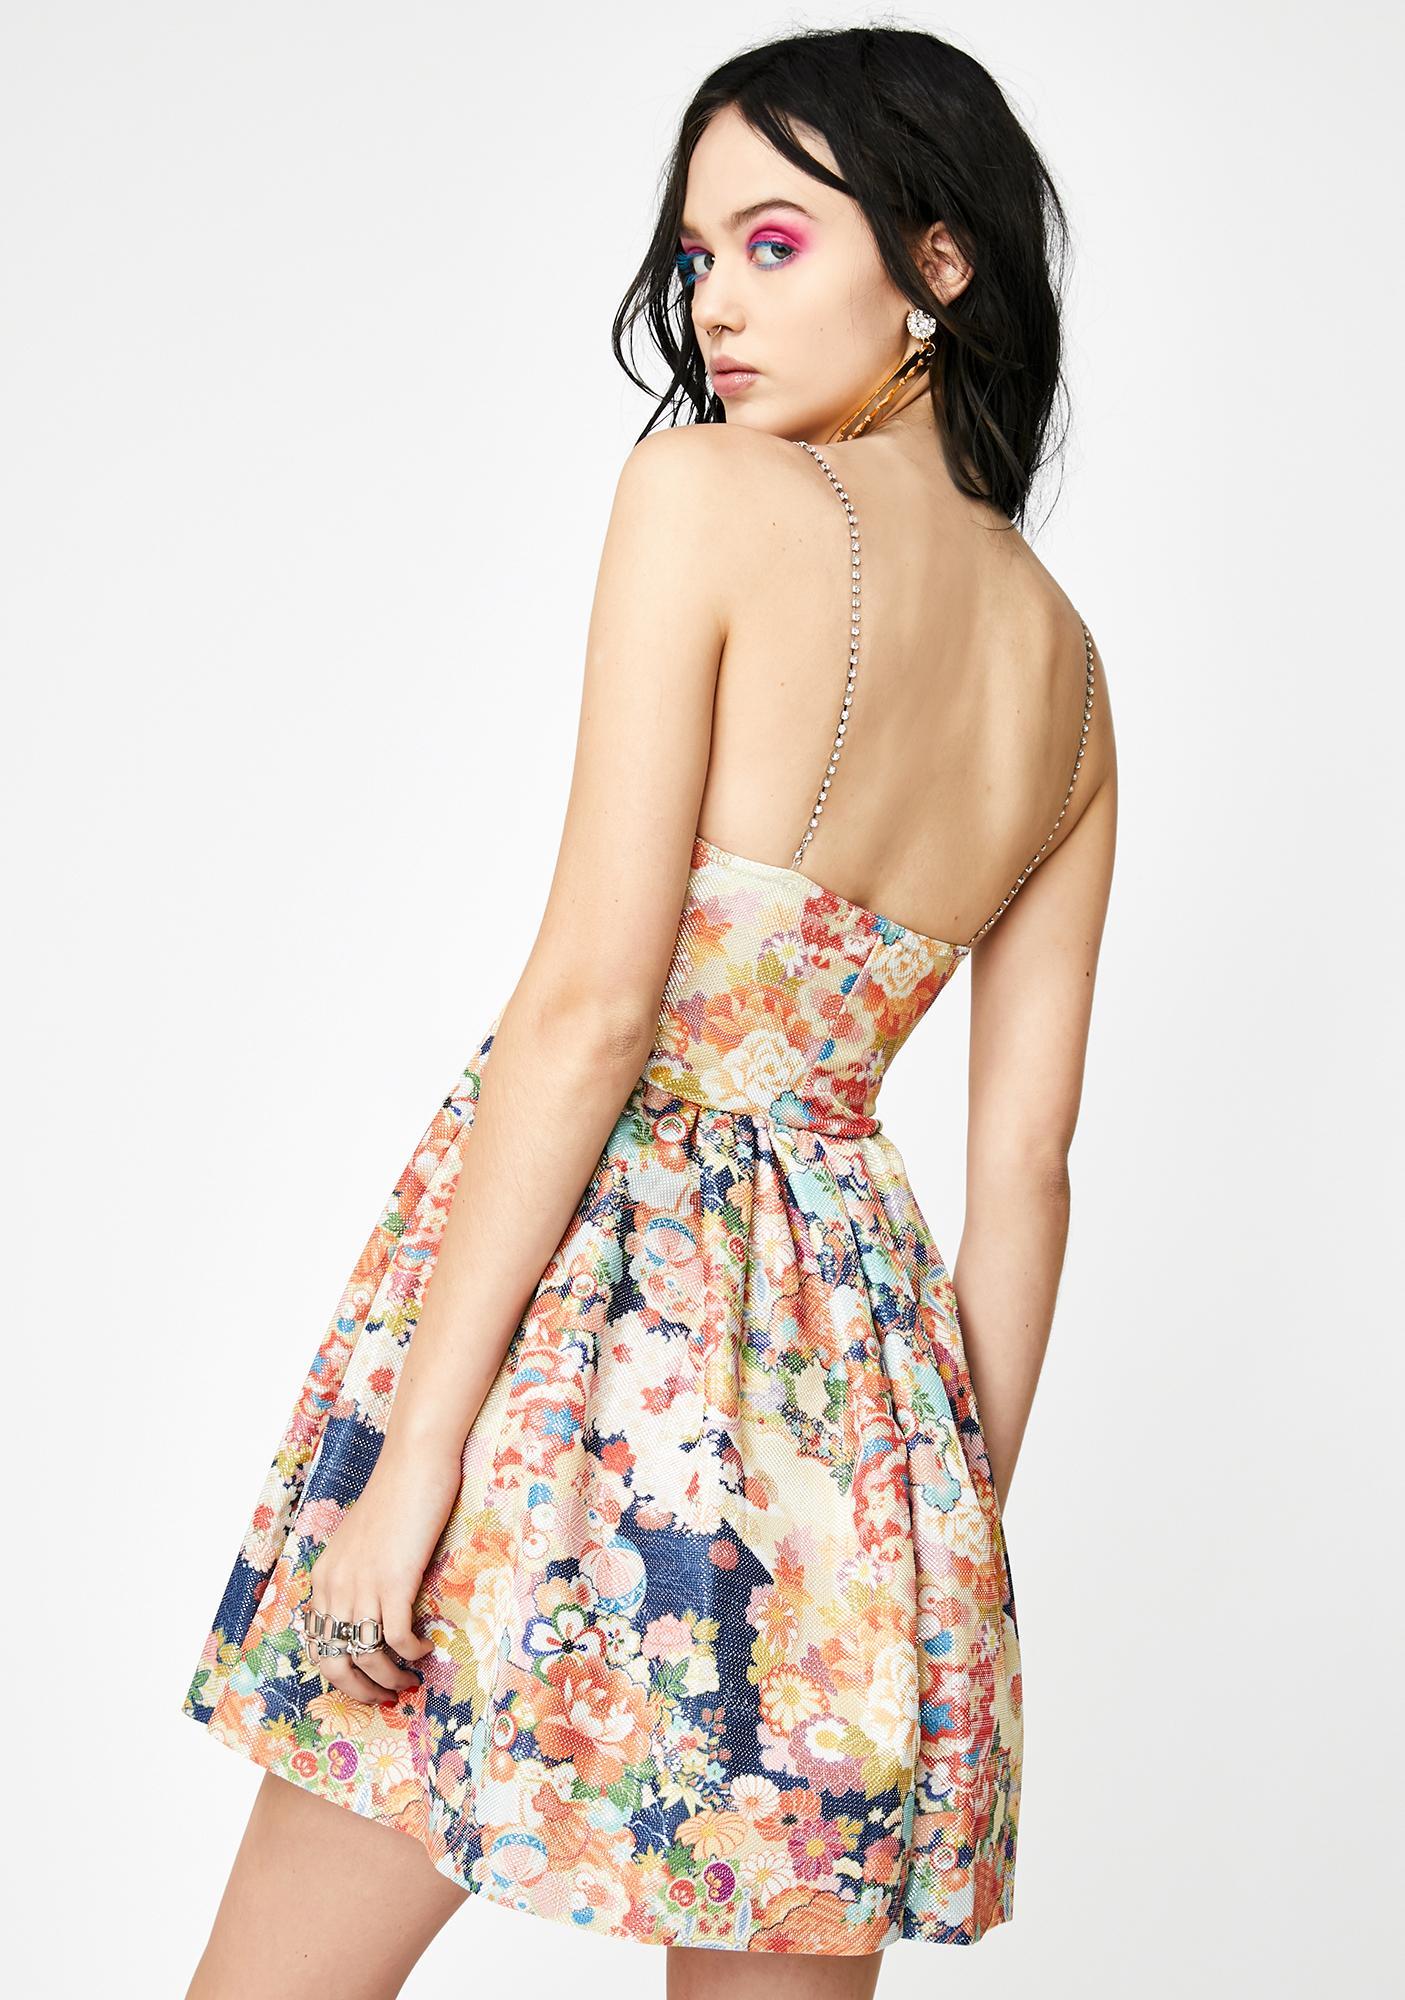 NEW GIRL ORDER Diamante Strap Floral Metallic Dress